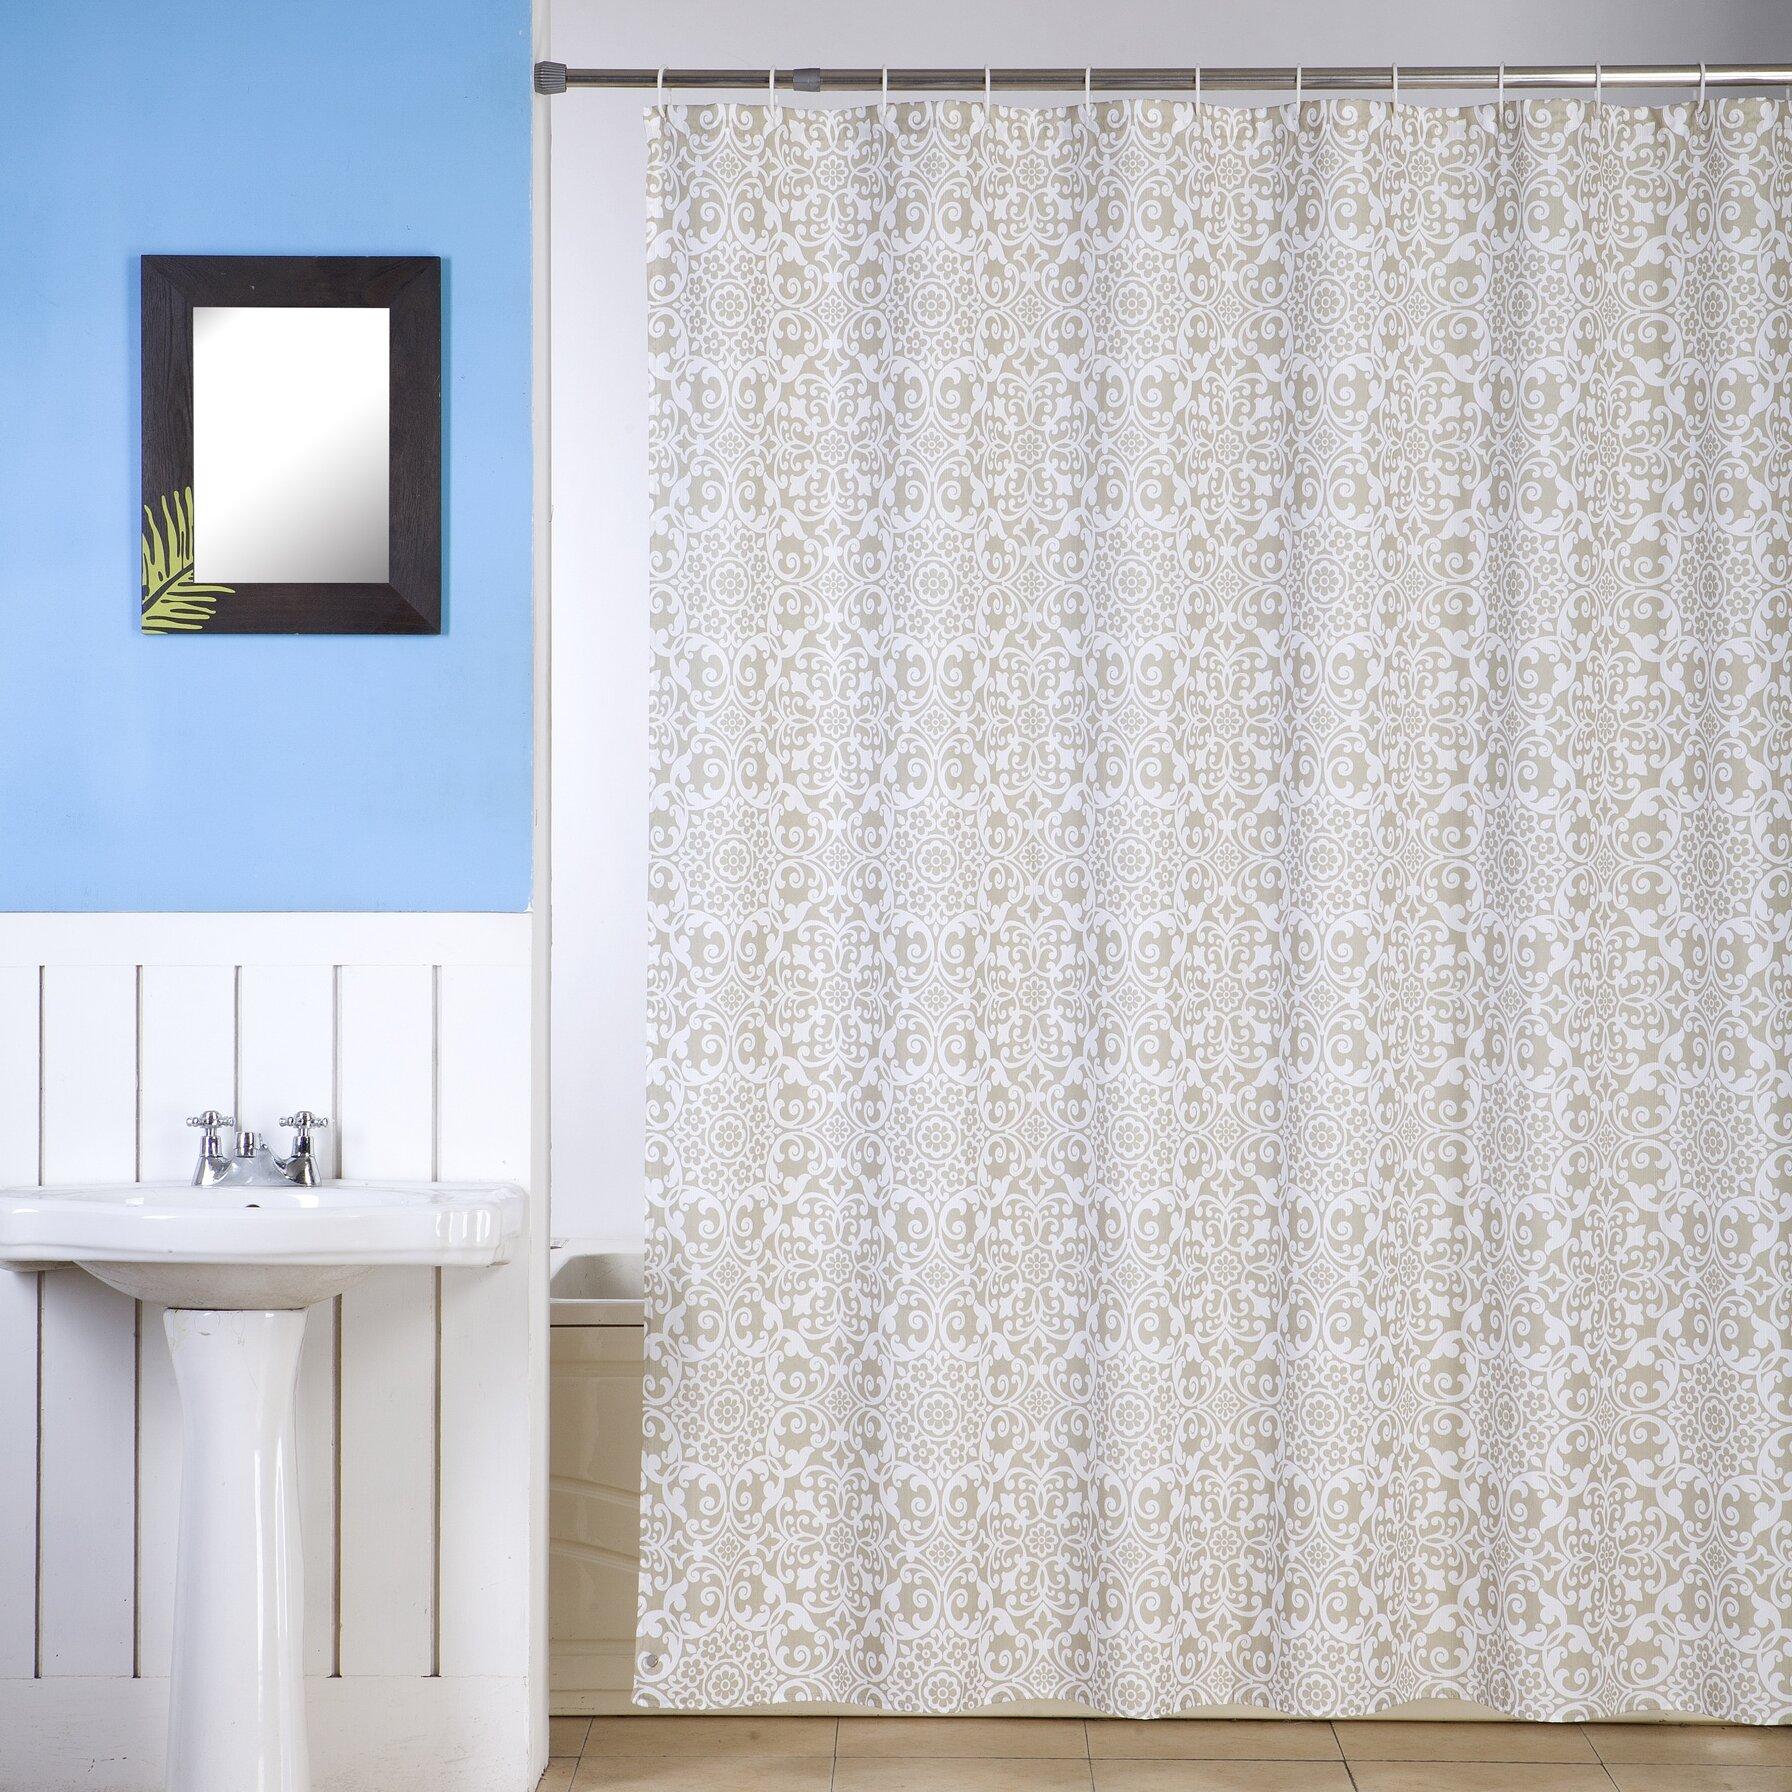 Merveilleux Ben And Jonah Royal Fabric Single Shower Curtain | Wayfair